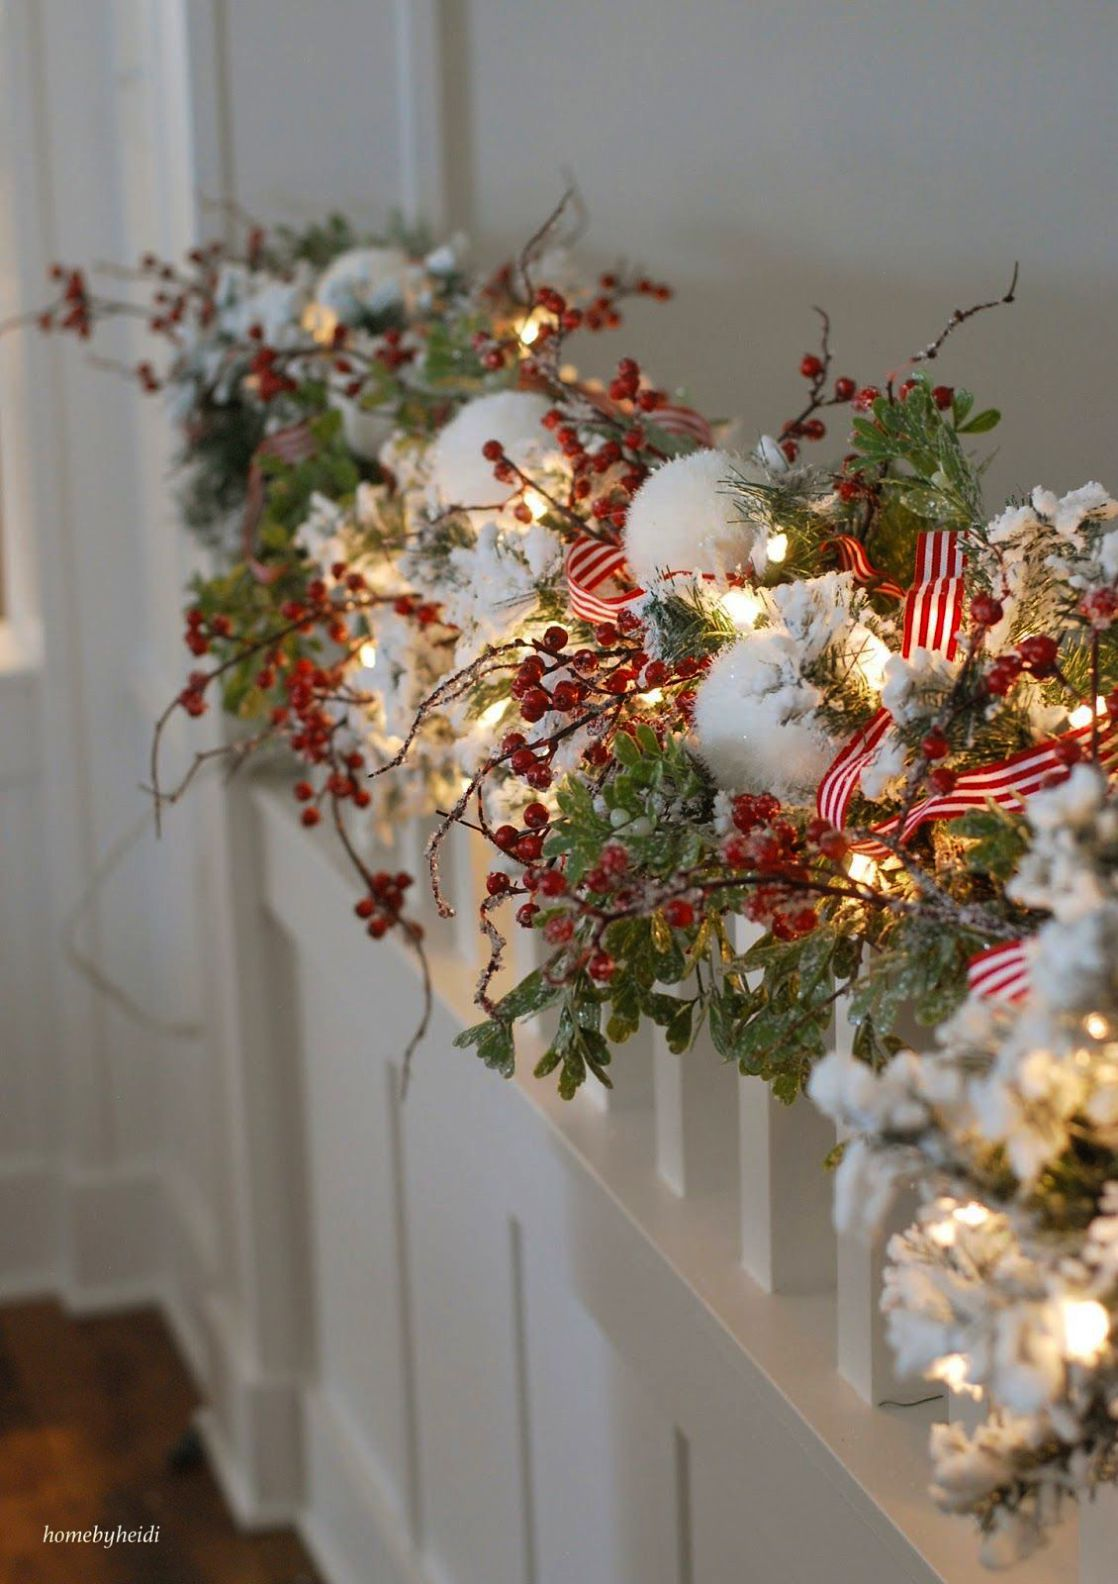 33++ Home depot canada outdoor christmas lights ideas